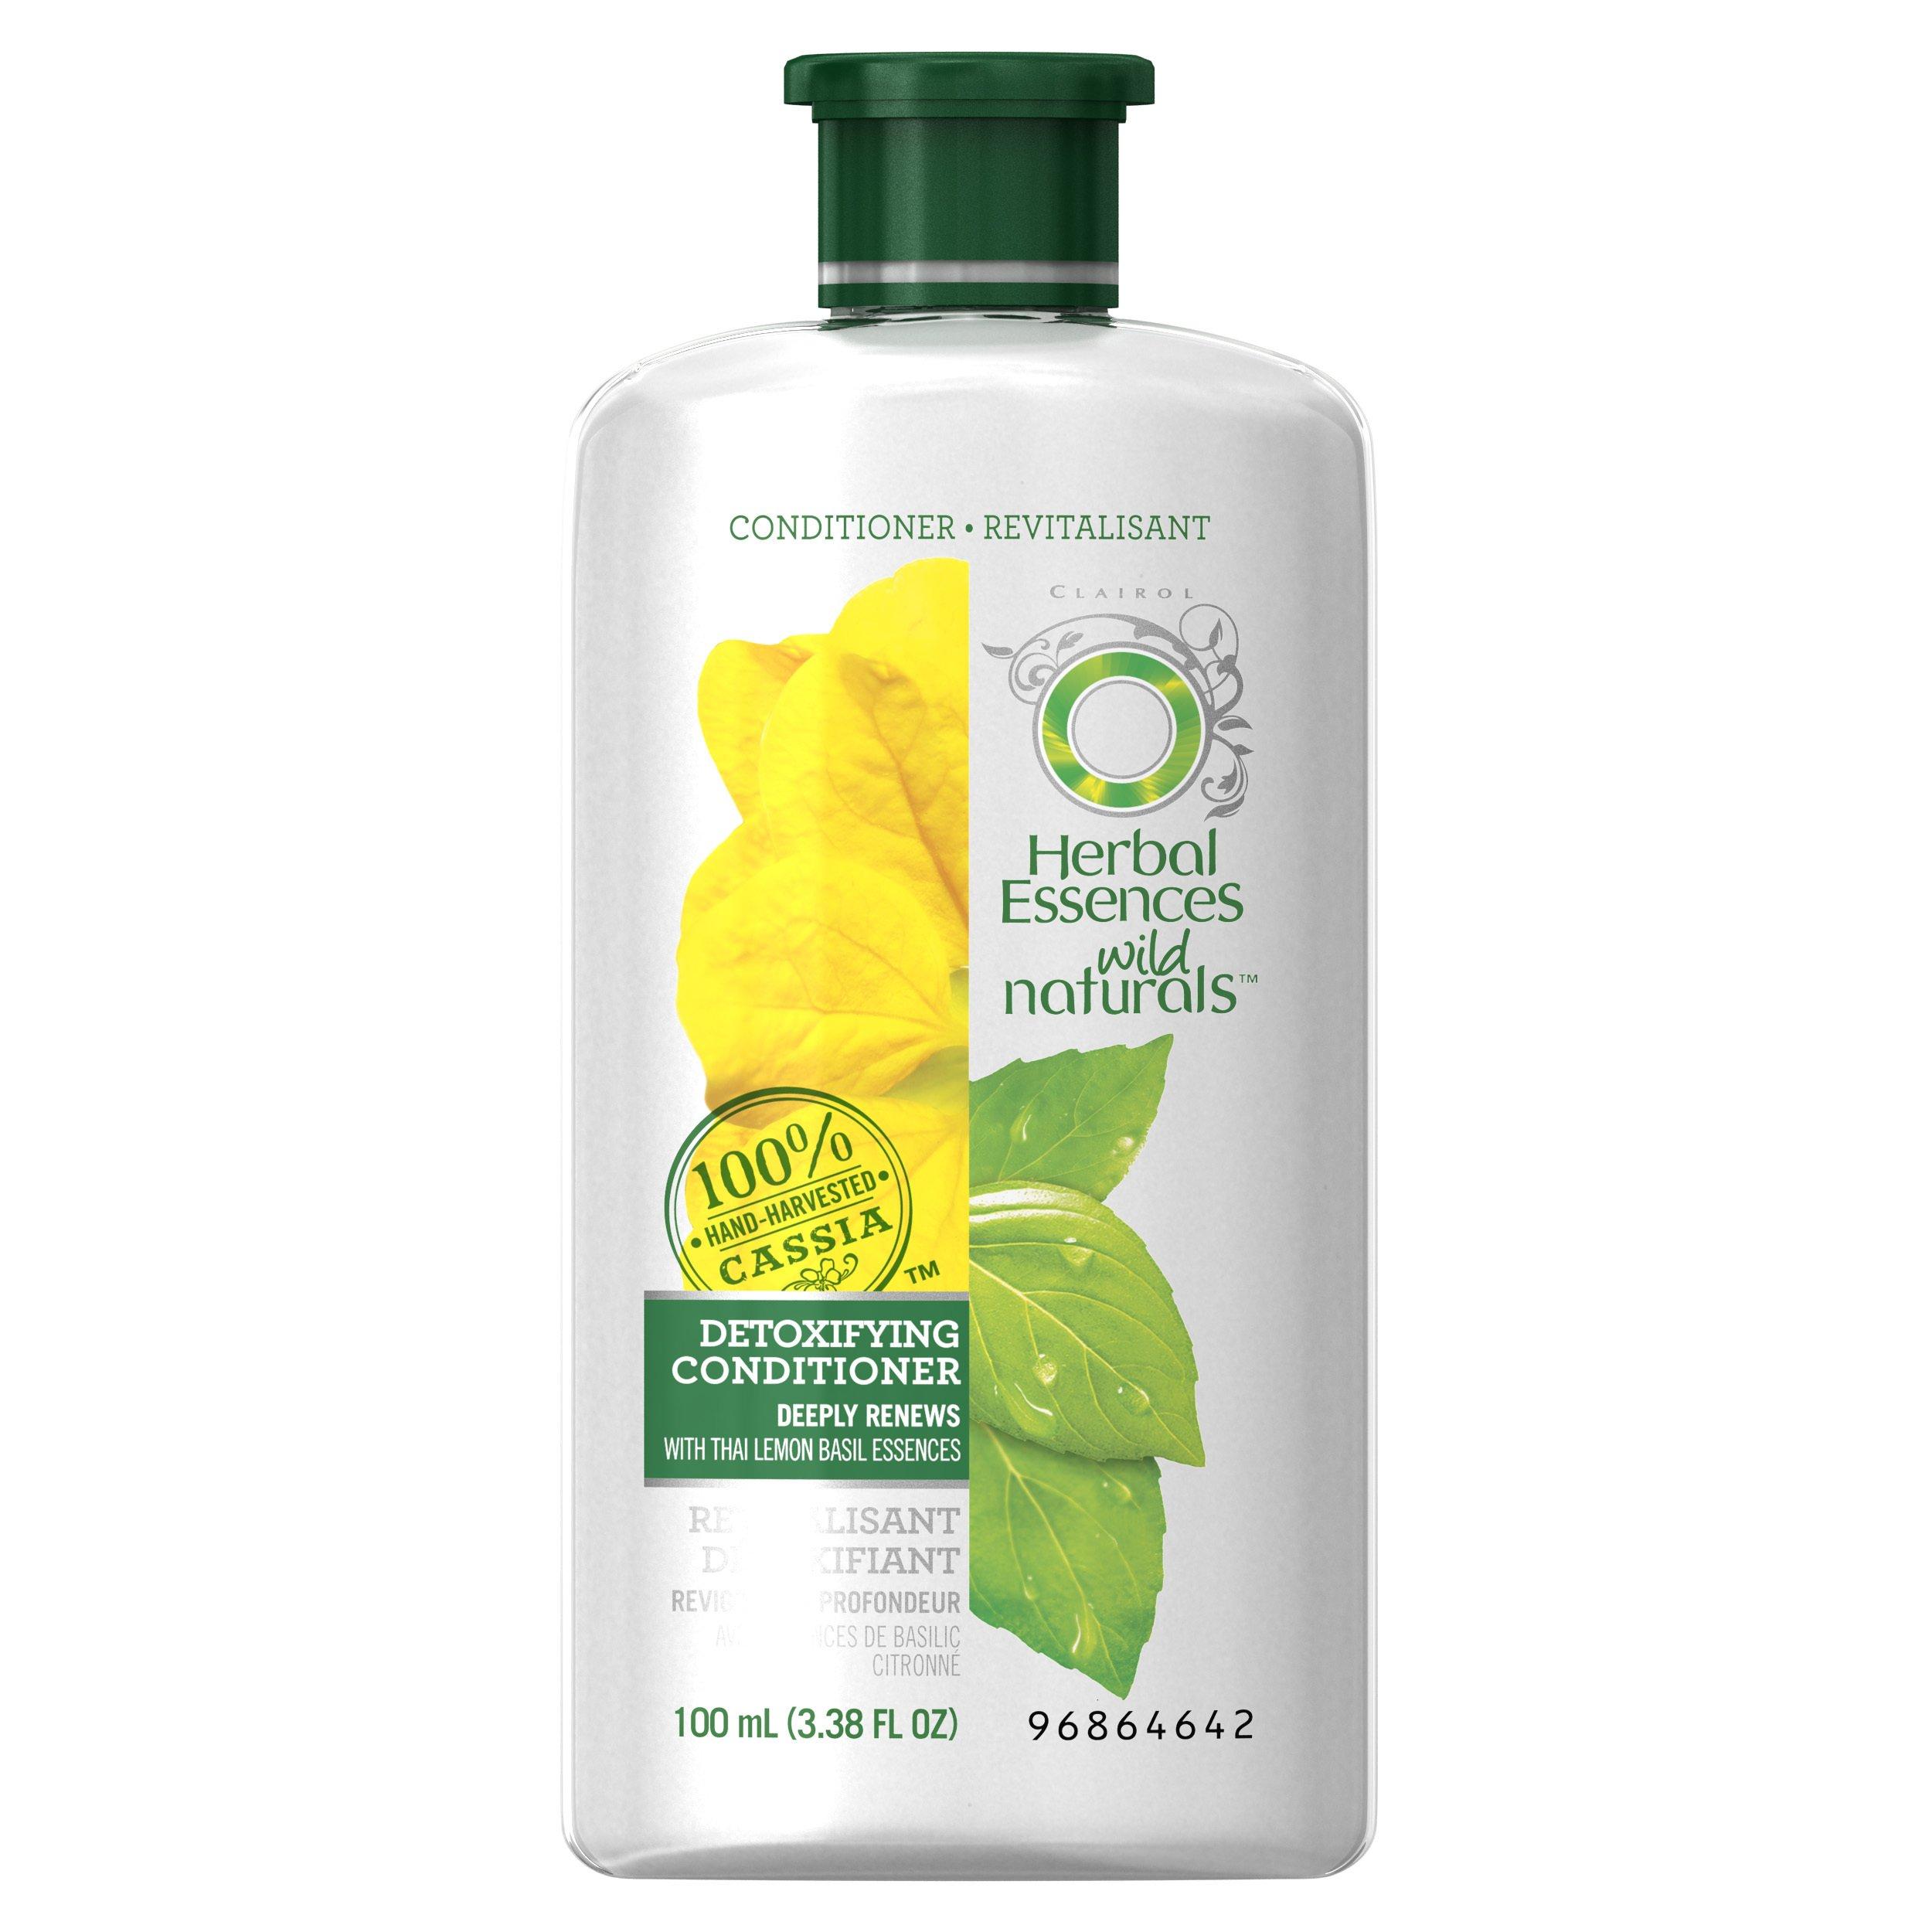 Herbal Essences Wild Naturals Detoxifying Conditioner, 3.38 FL OZ by Herbal Essences (Image #1)